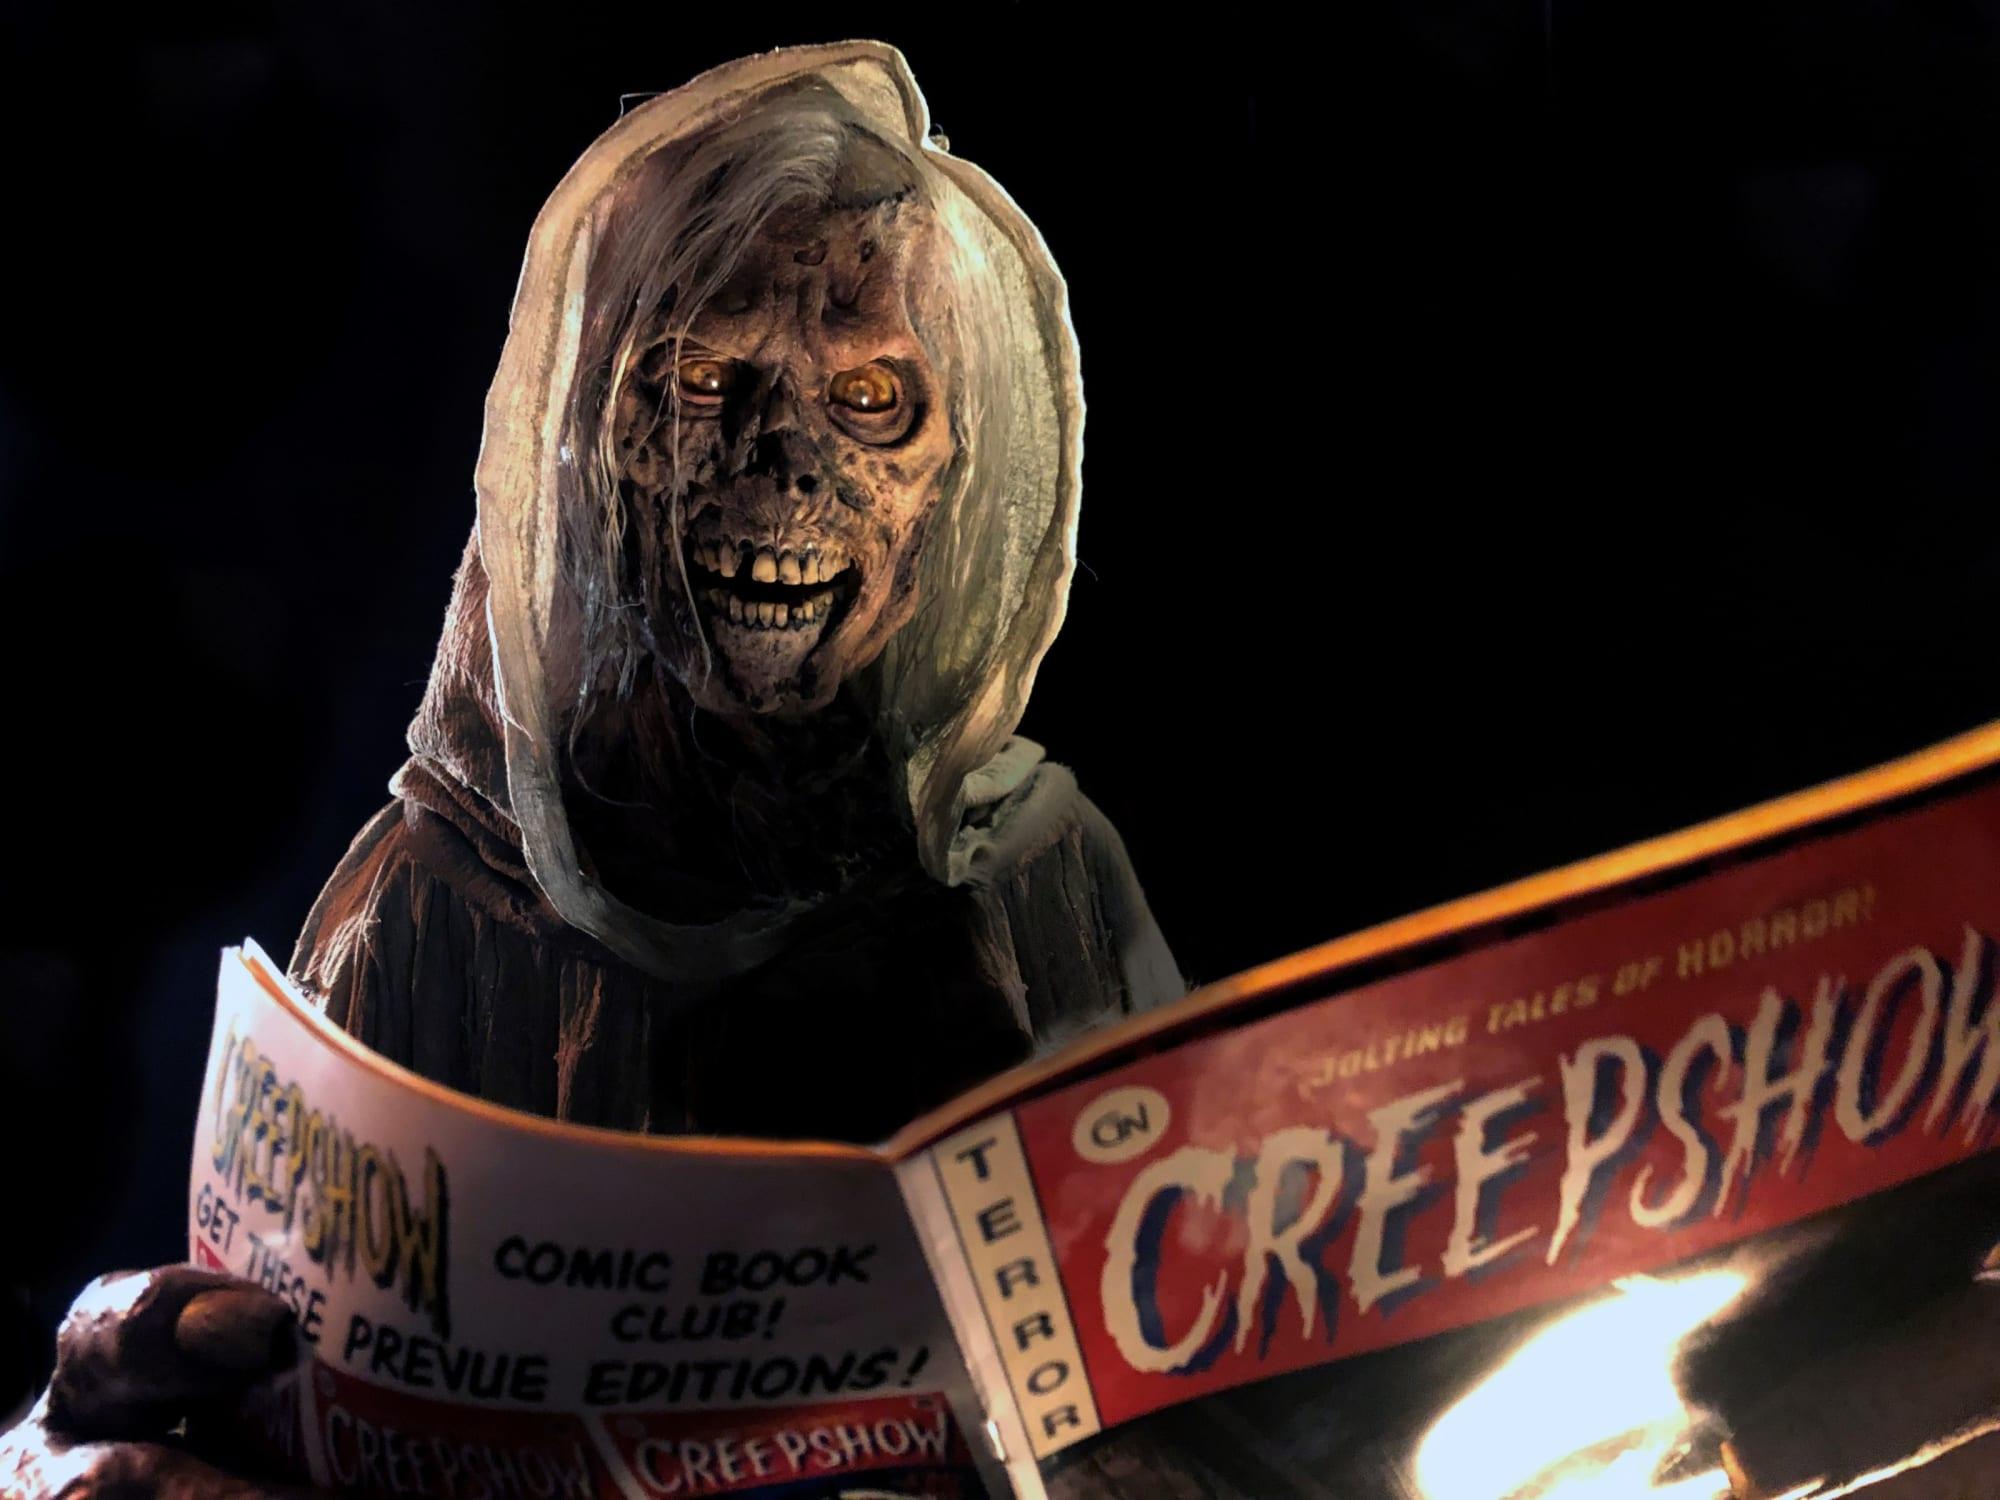 The Creepshow Halloween Special coming in October